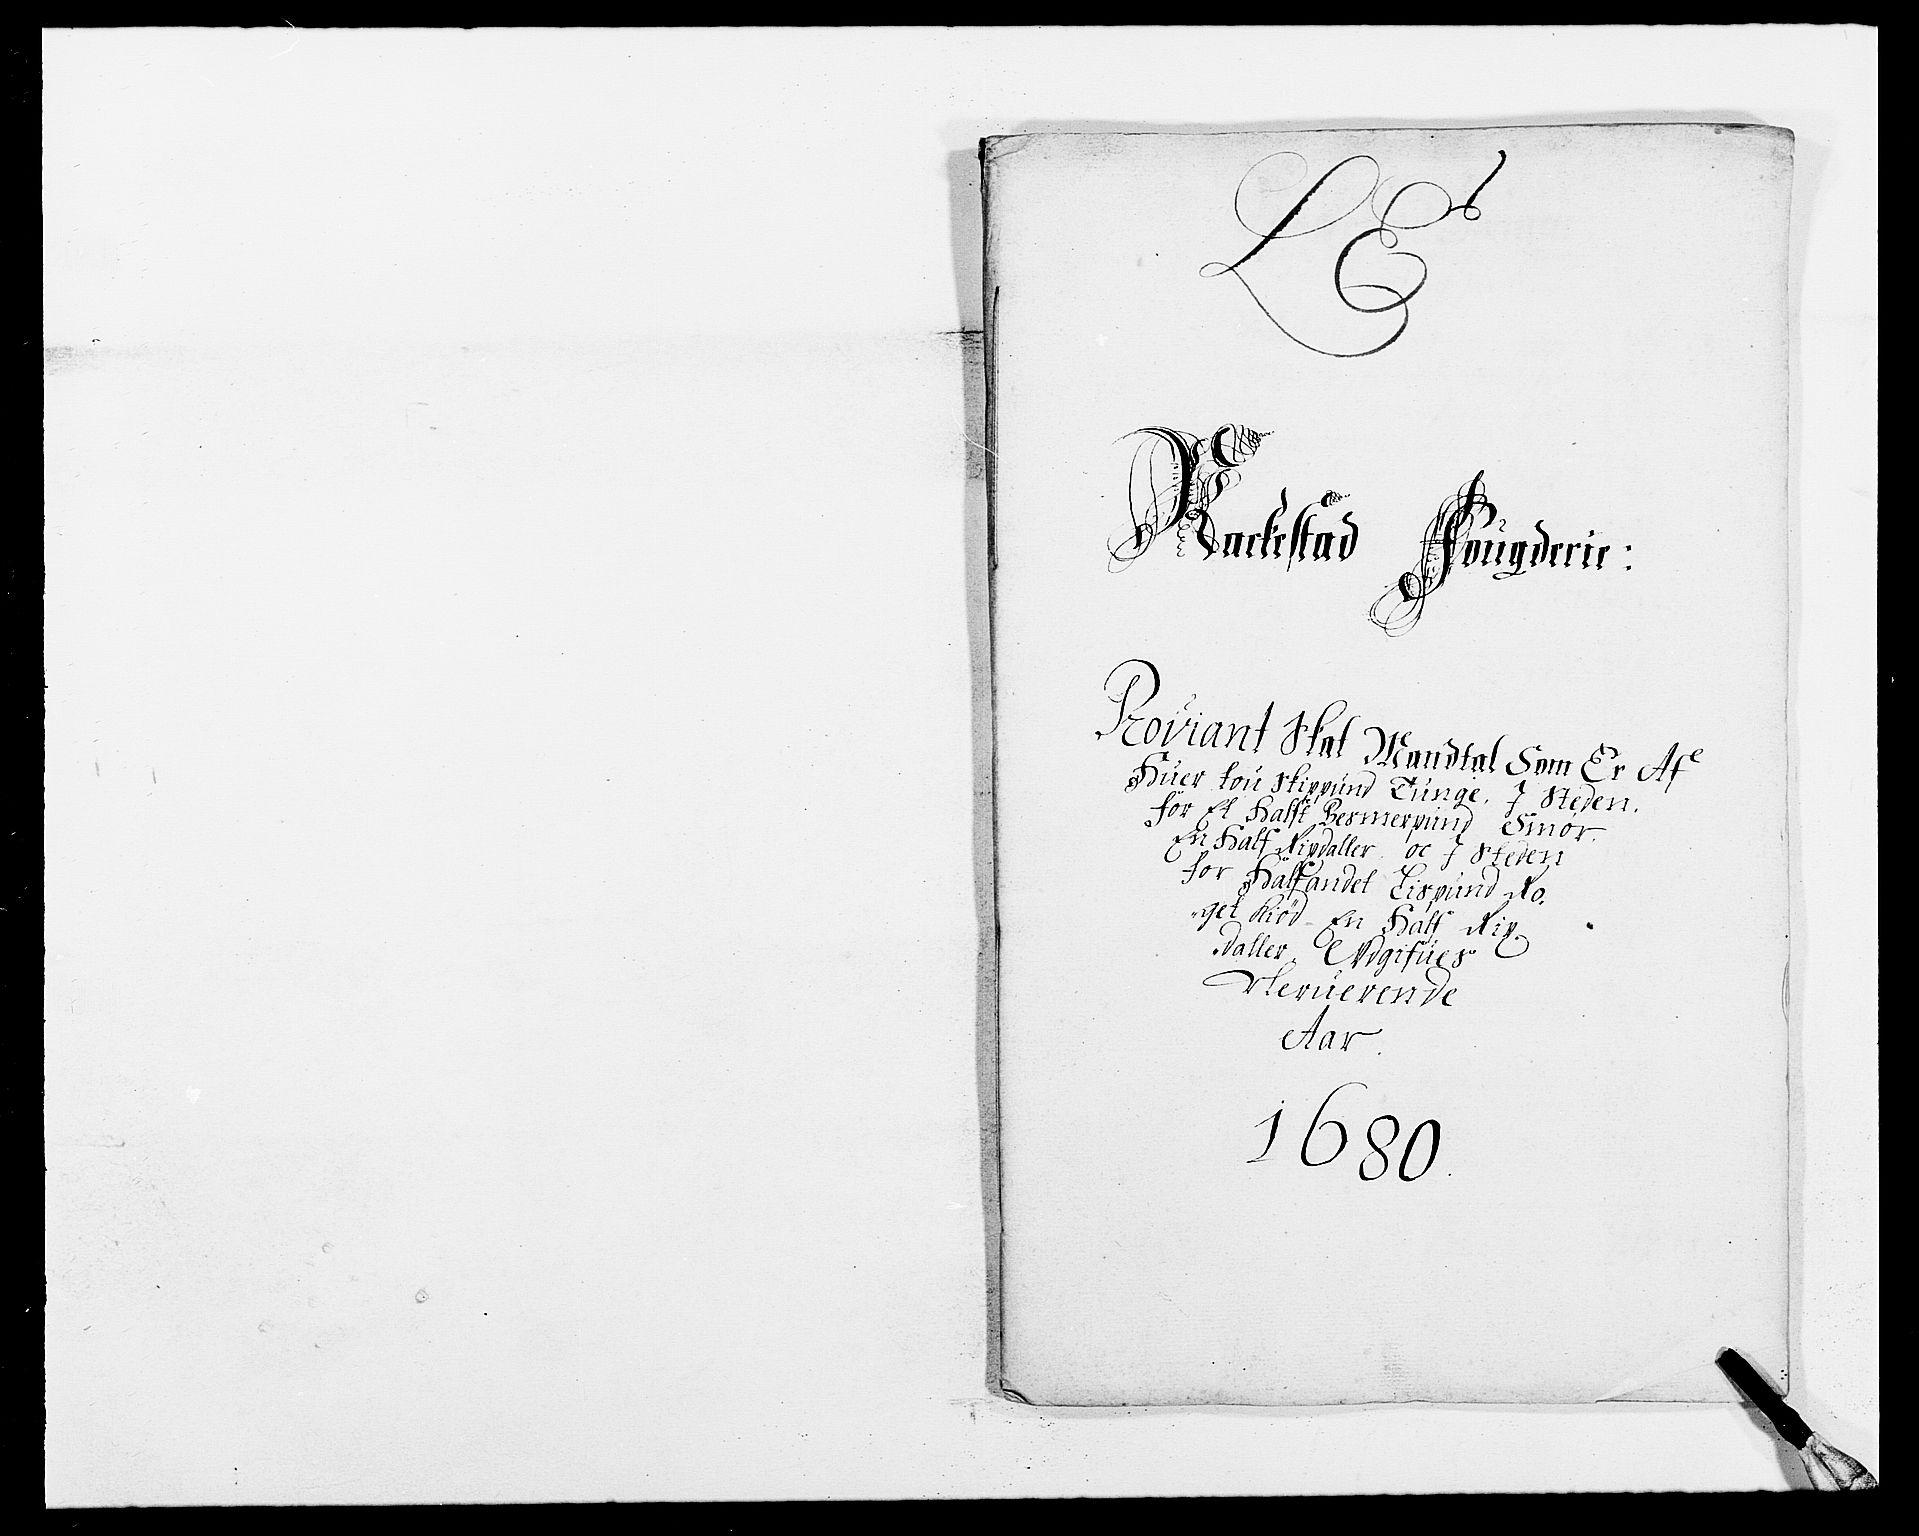 RA, Rentekammeret inntil 1814, Reviderte regnskaper, Fogderegnskap, R05/L0272: Fogderegnskap Rakkestad, 1680-1681, s. 138